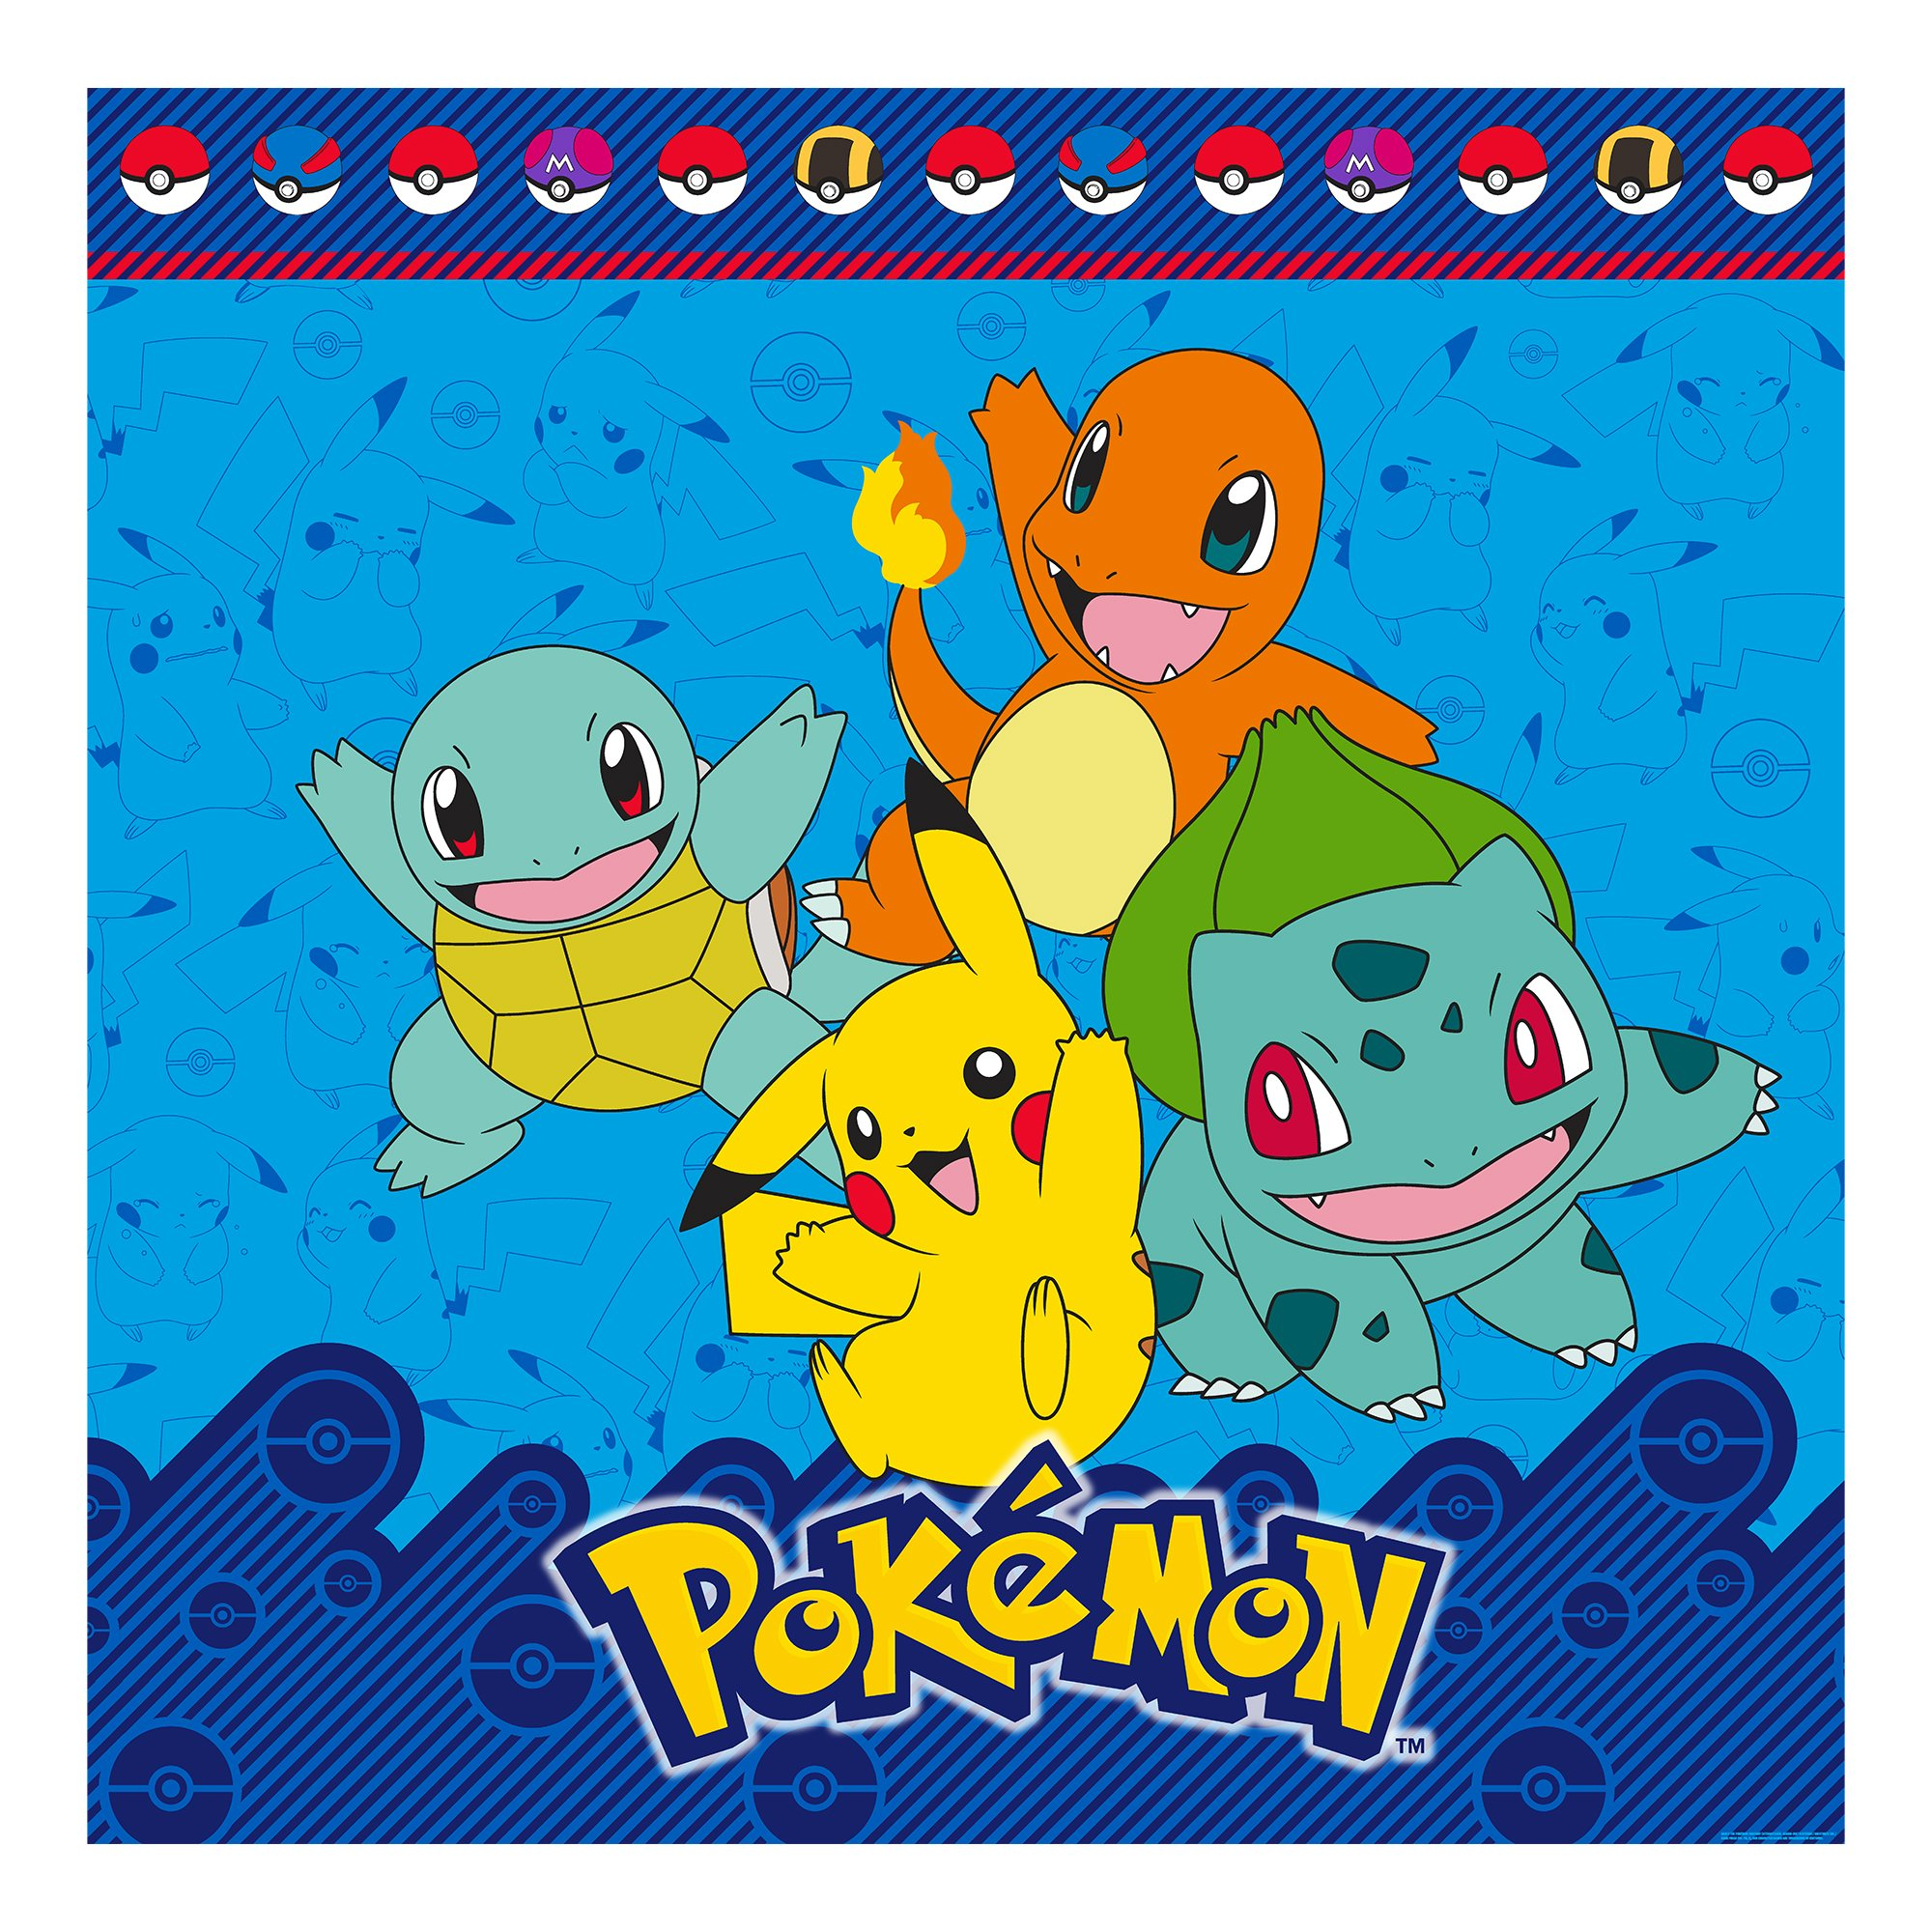 Pokemon Bath Set, Shower Curtain, Hooks, Bath Rug, Wastebasket, and Towel